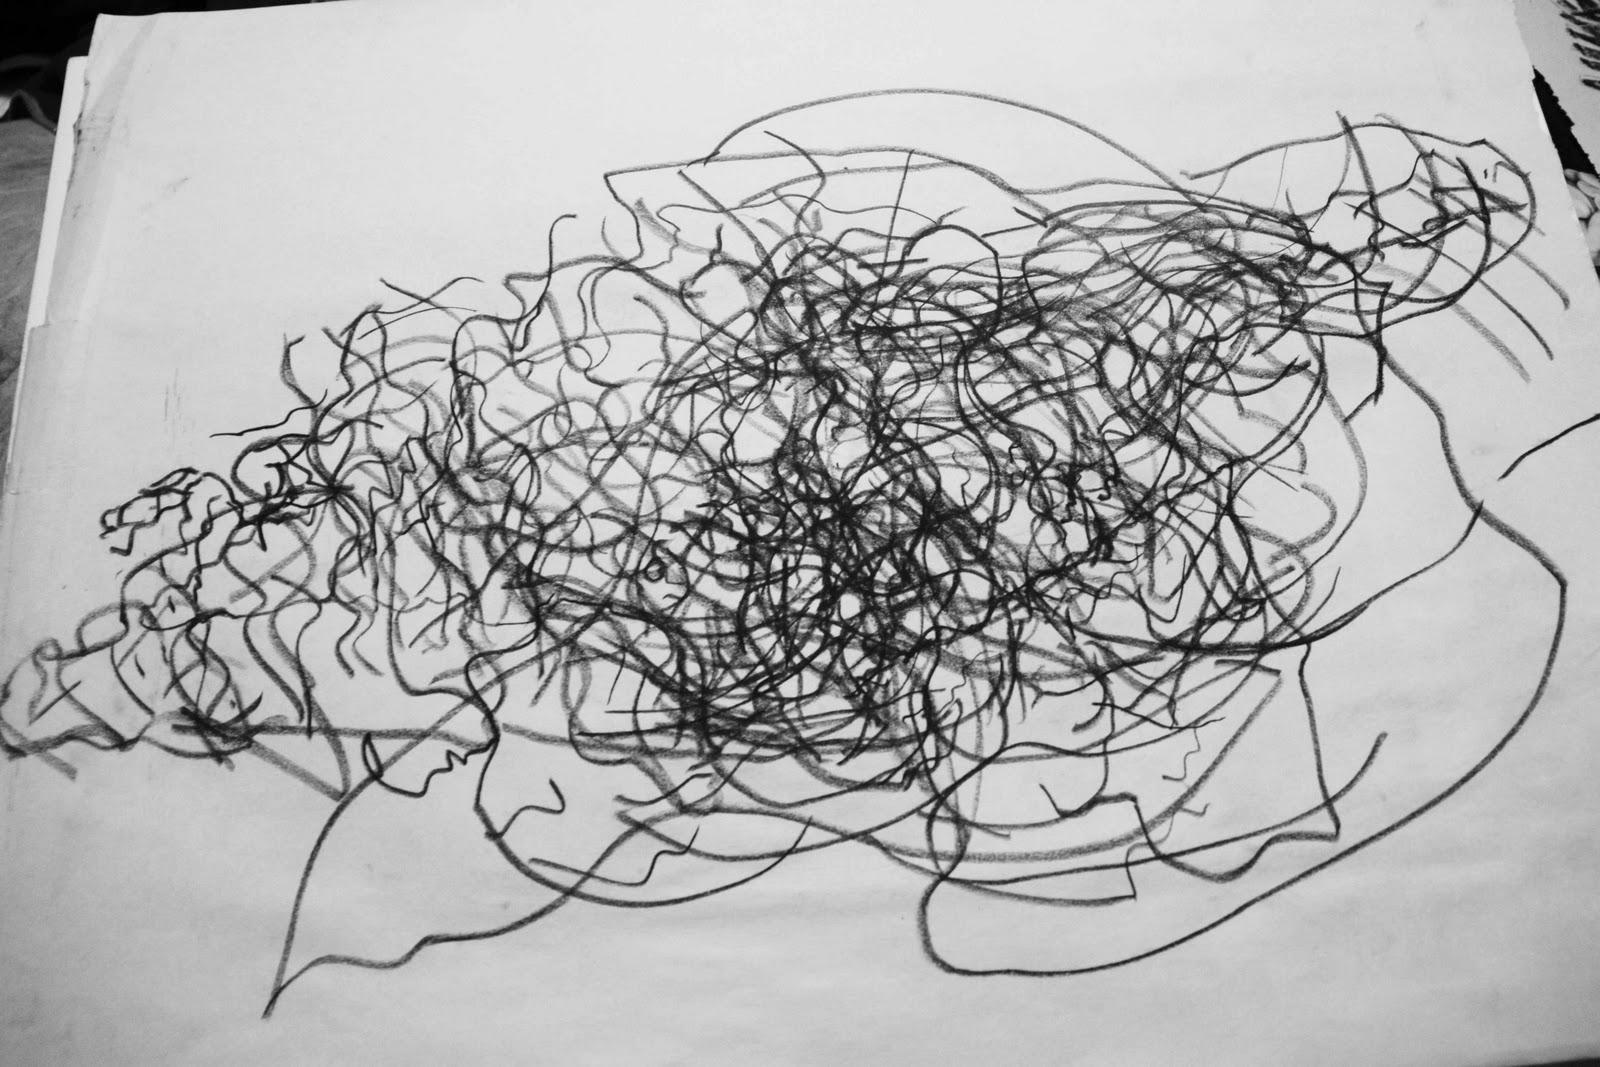 Contour Line Drawing Shell : Beau hestekin blind contour drawings